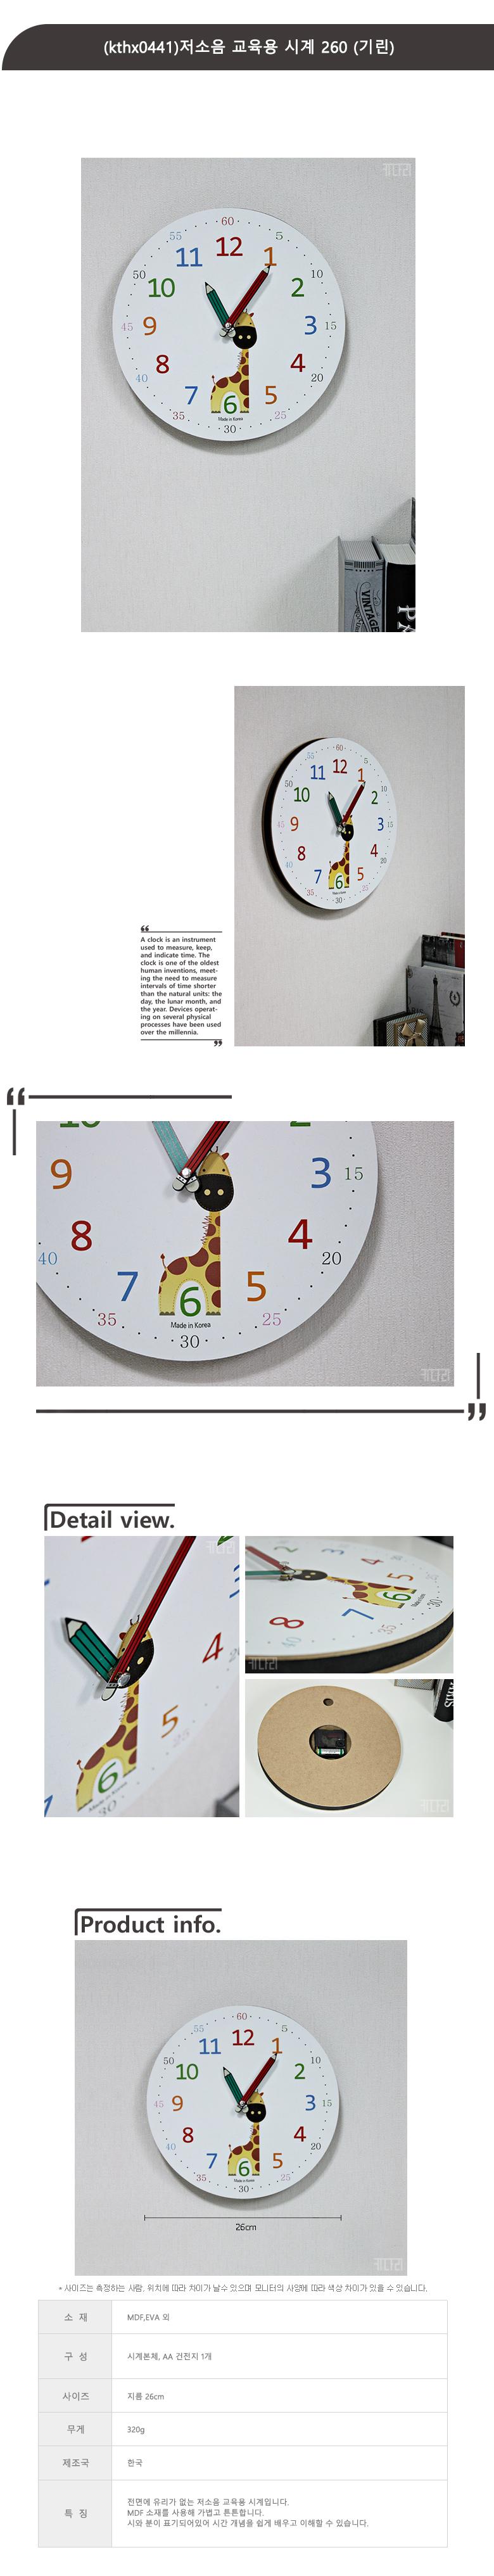 (kthx0441)저소음 교육용 시계 260 (기린) - 키다리, 14,000원, 벽시계, 우드벽시계